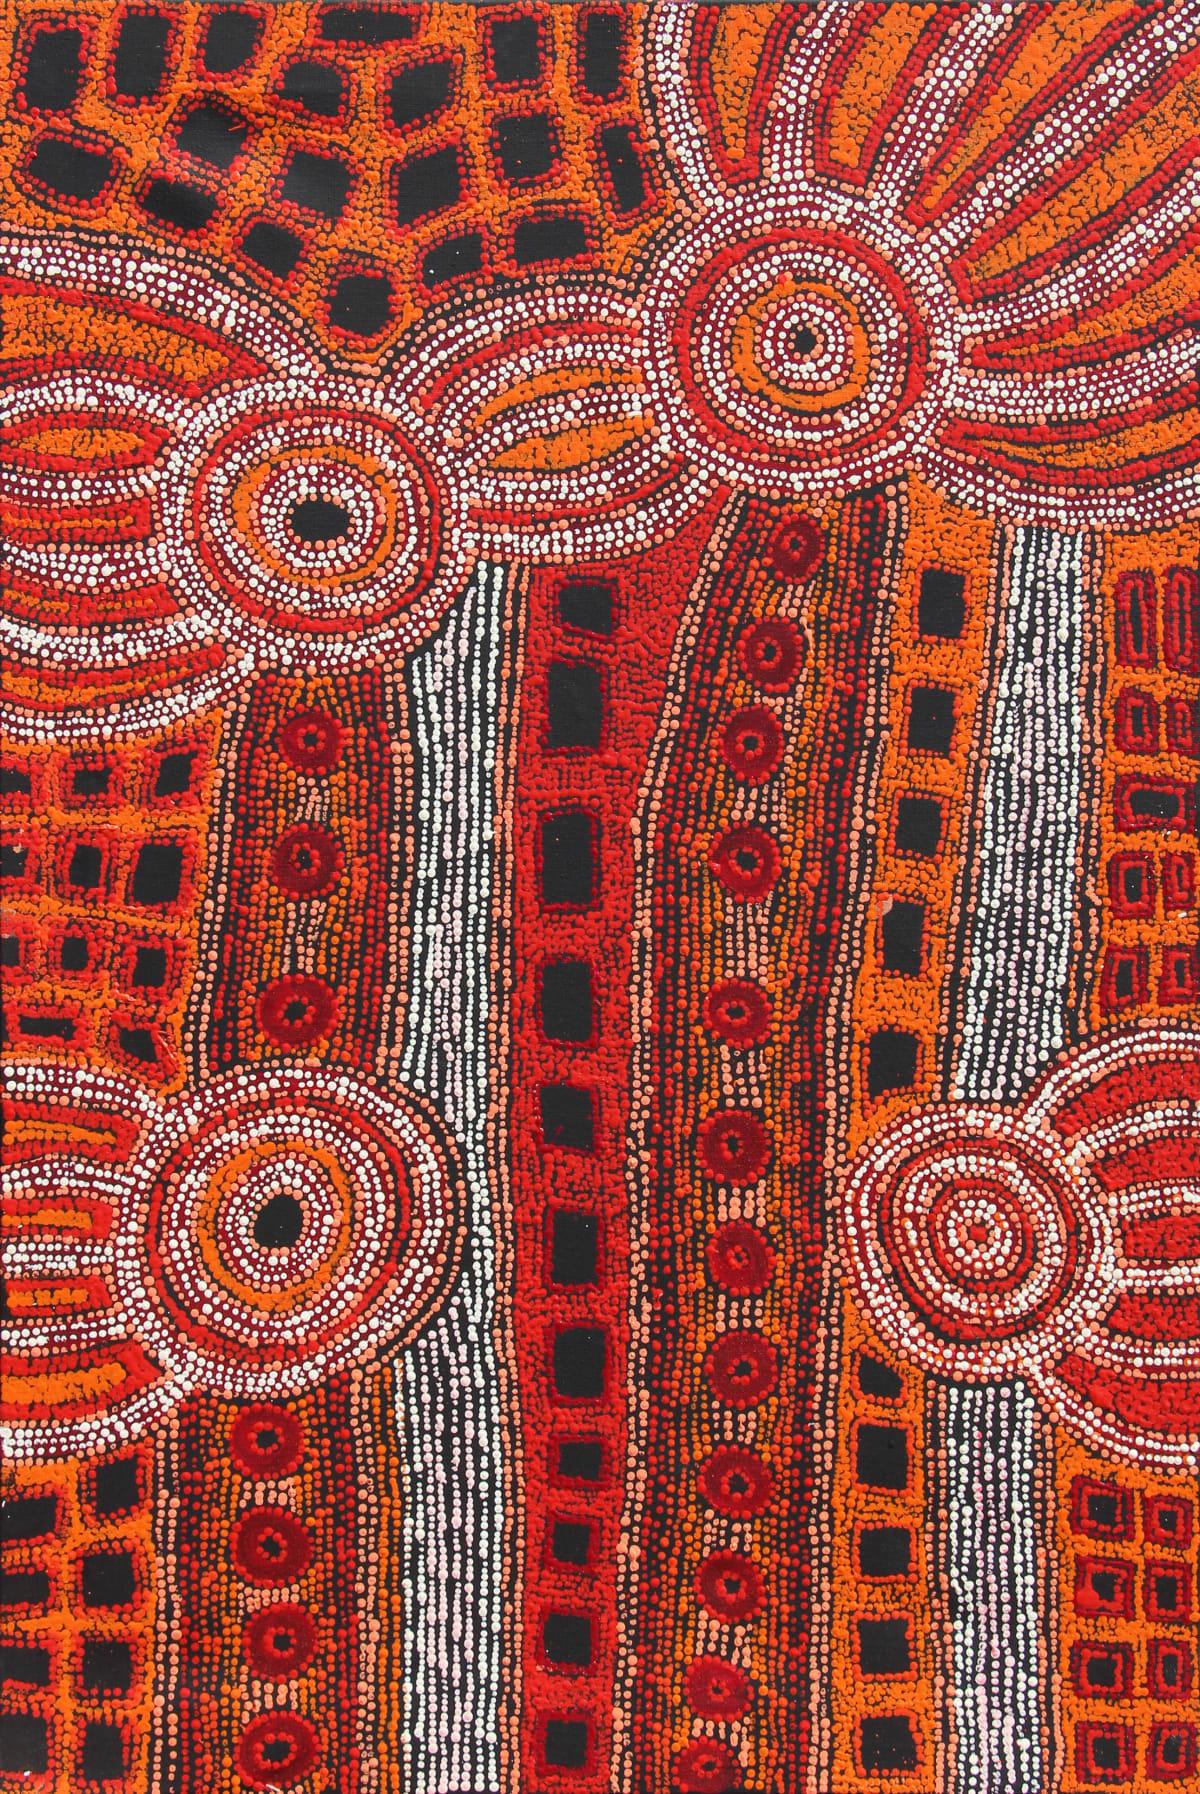 Rosalind Tjanyari Ngura Kutti (Spirit Country), 2019 Acrylic on Linen 81 x 122cm